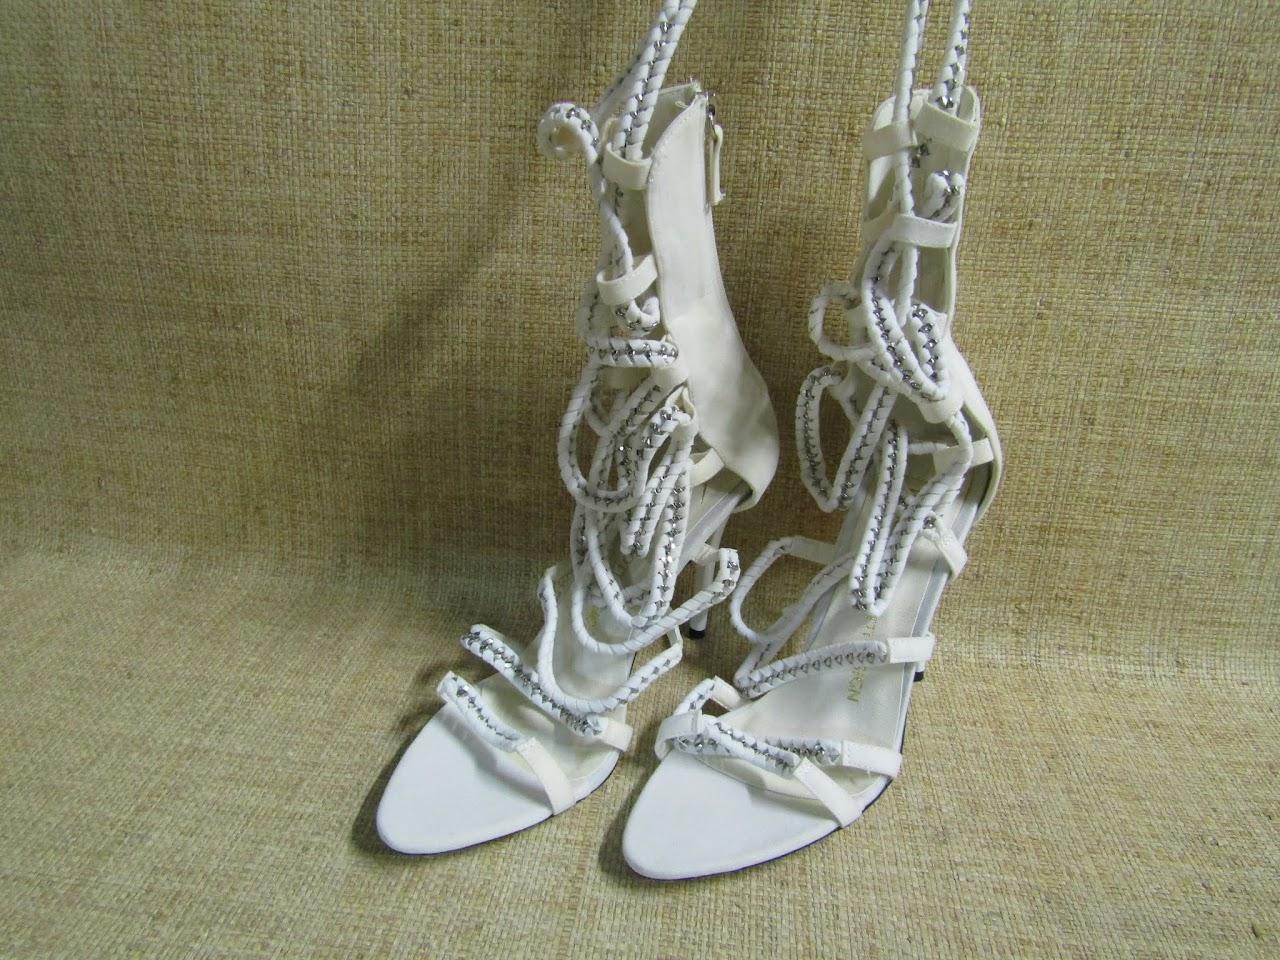 Giuseppe Zanotti Rope Sandals